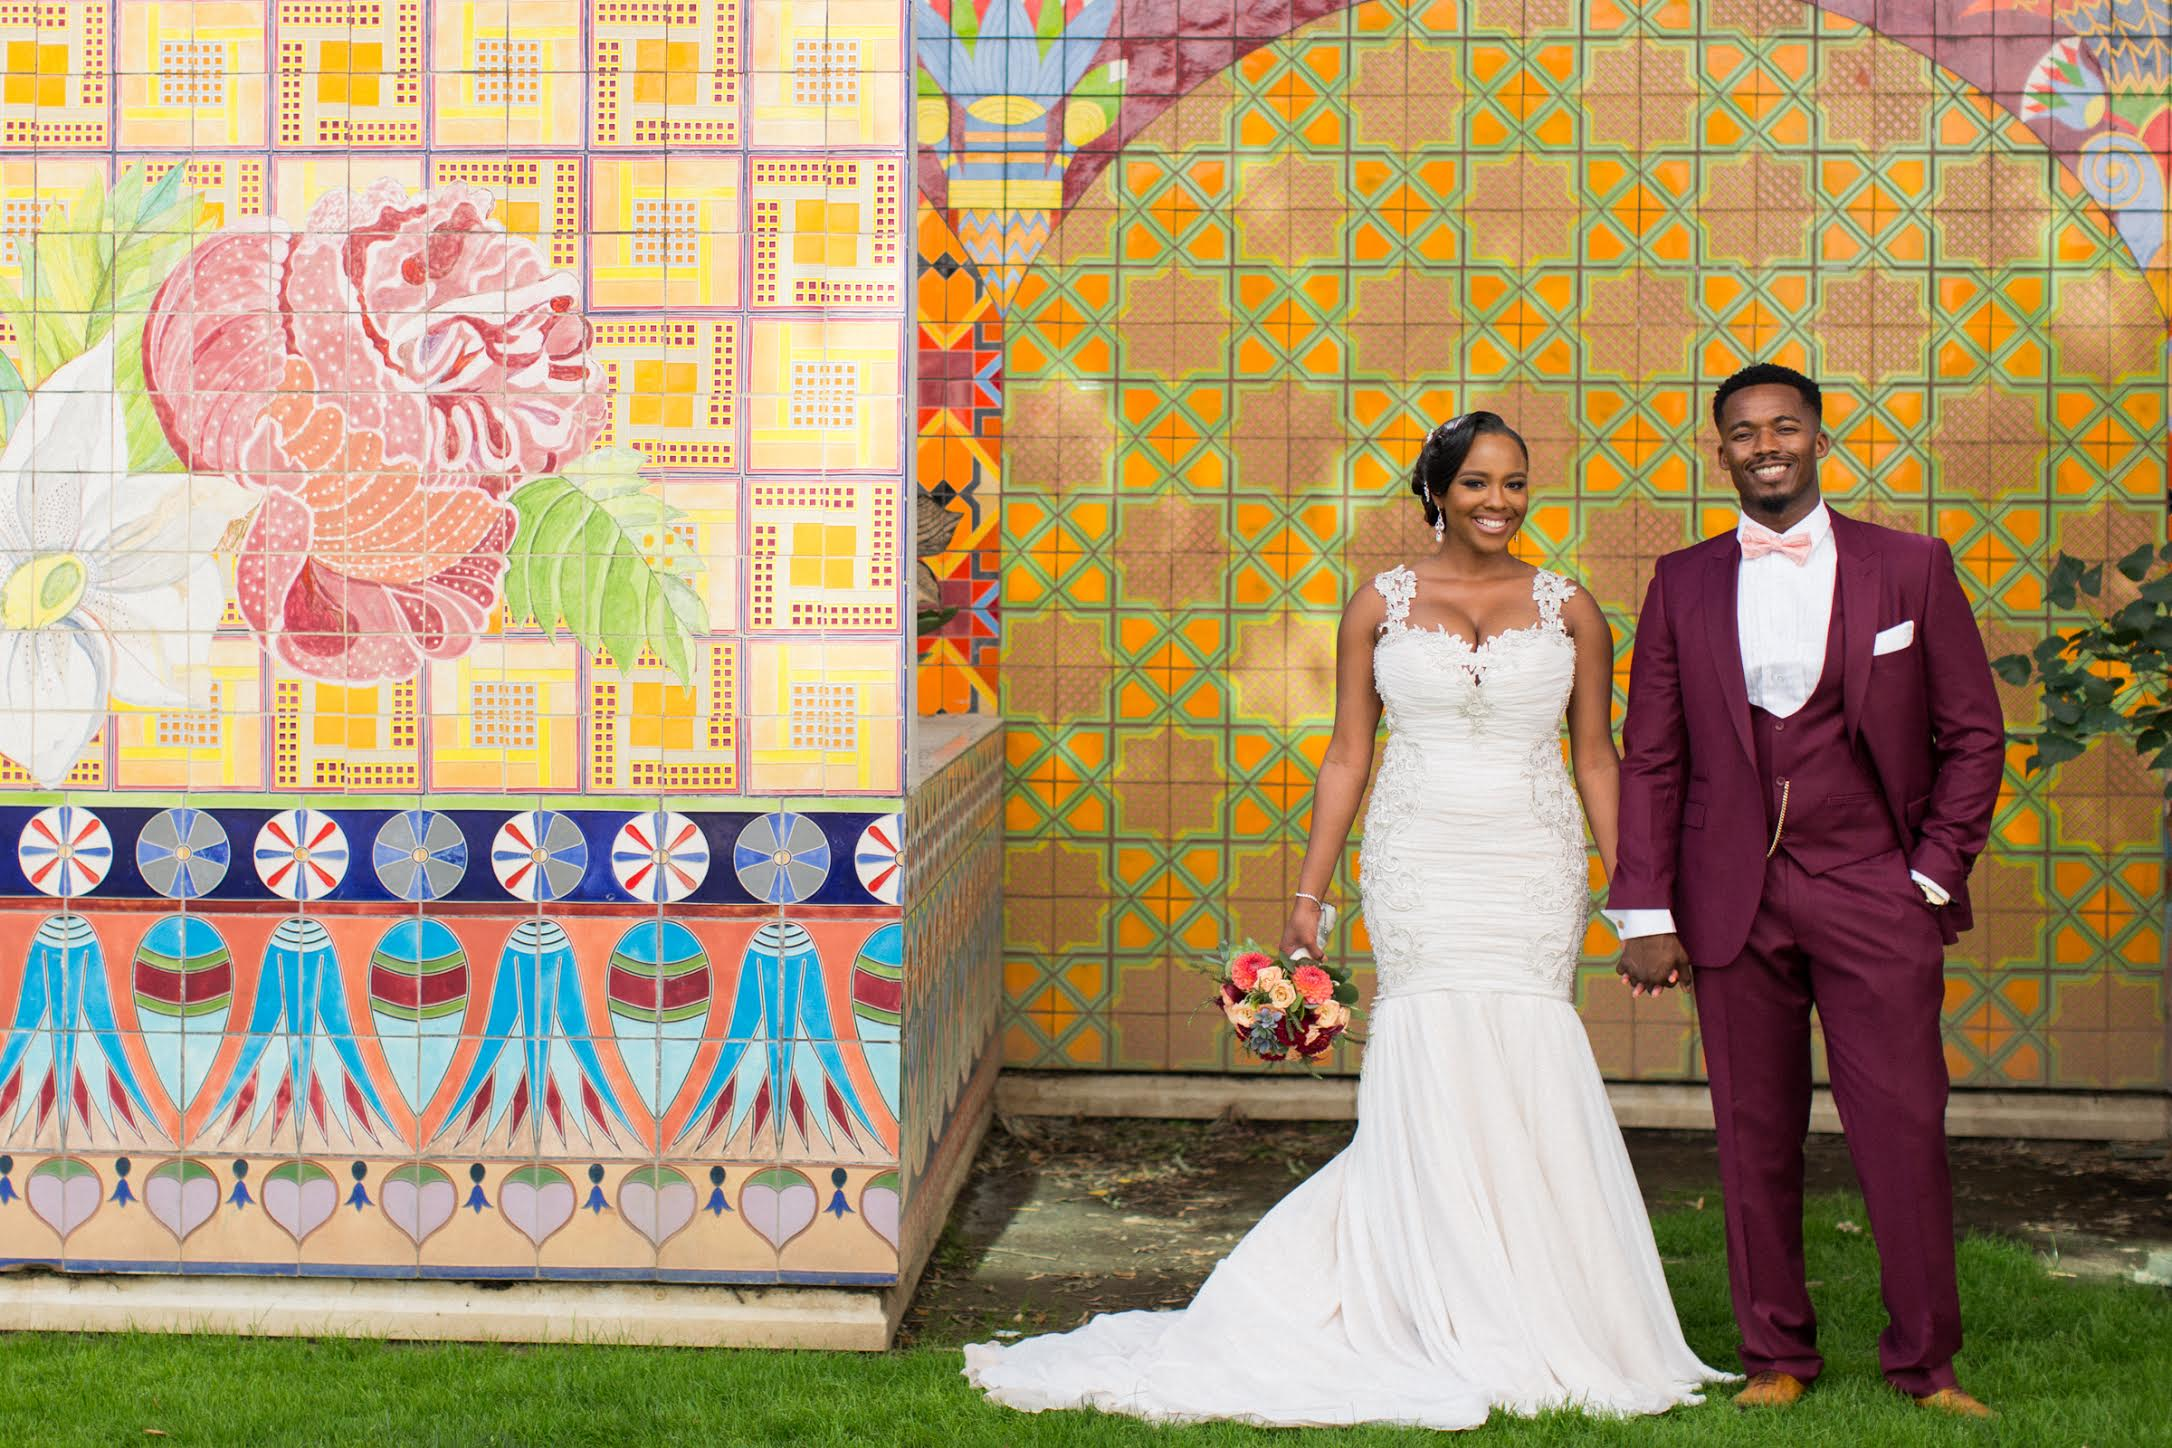 Tasha wedding2.jpg